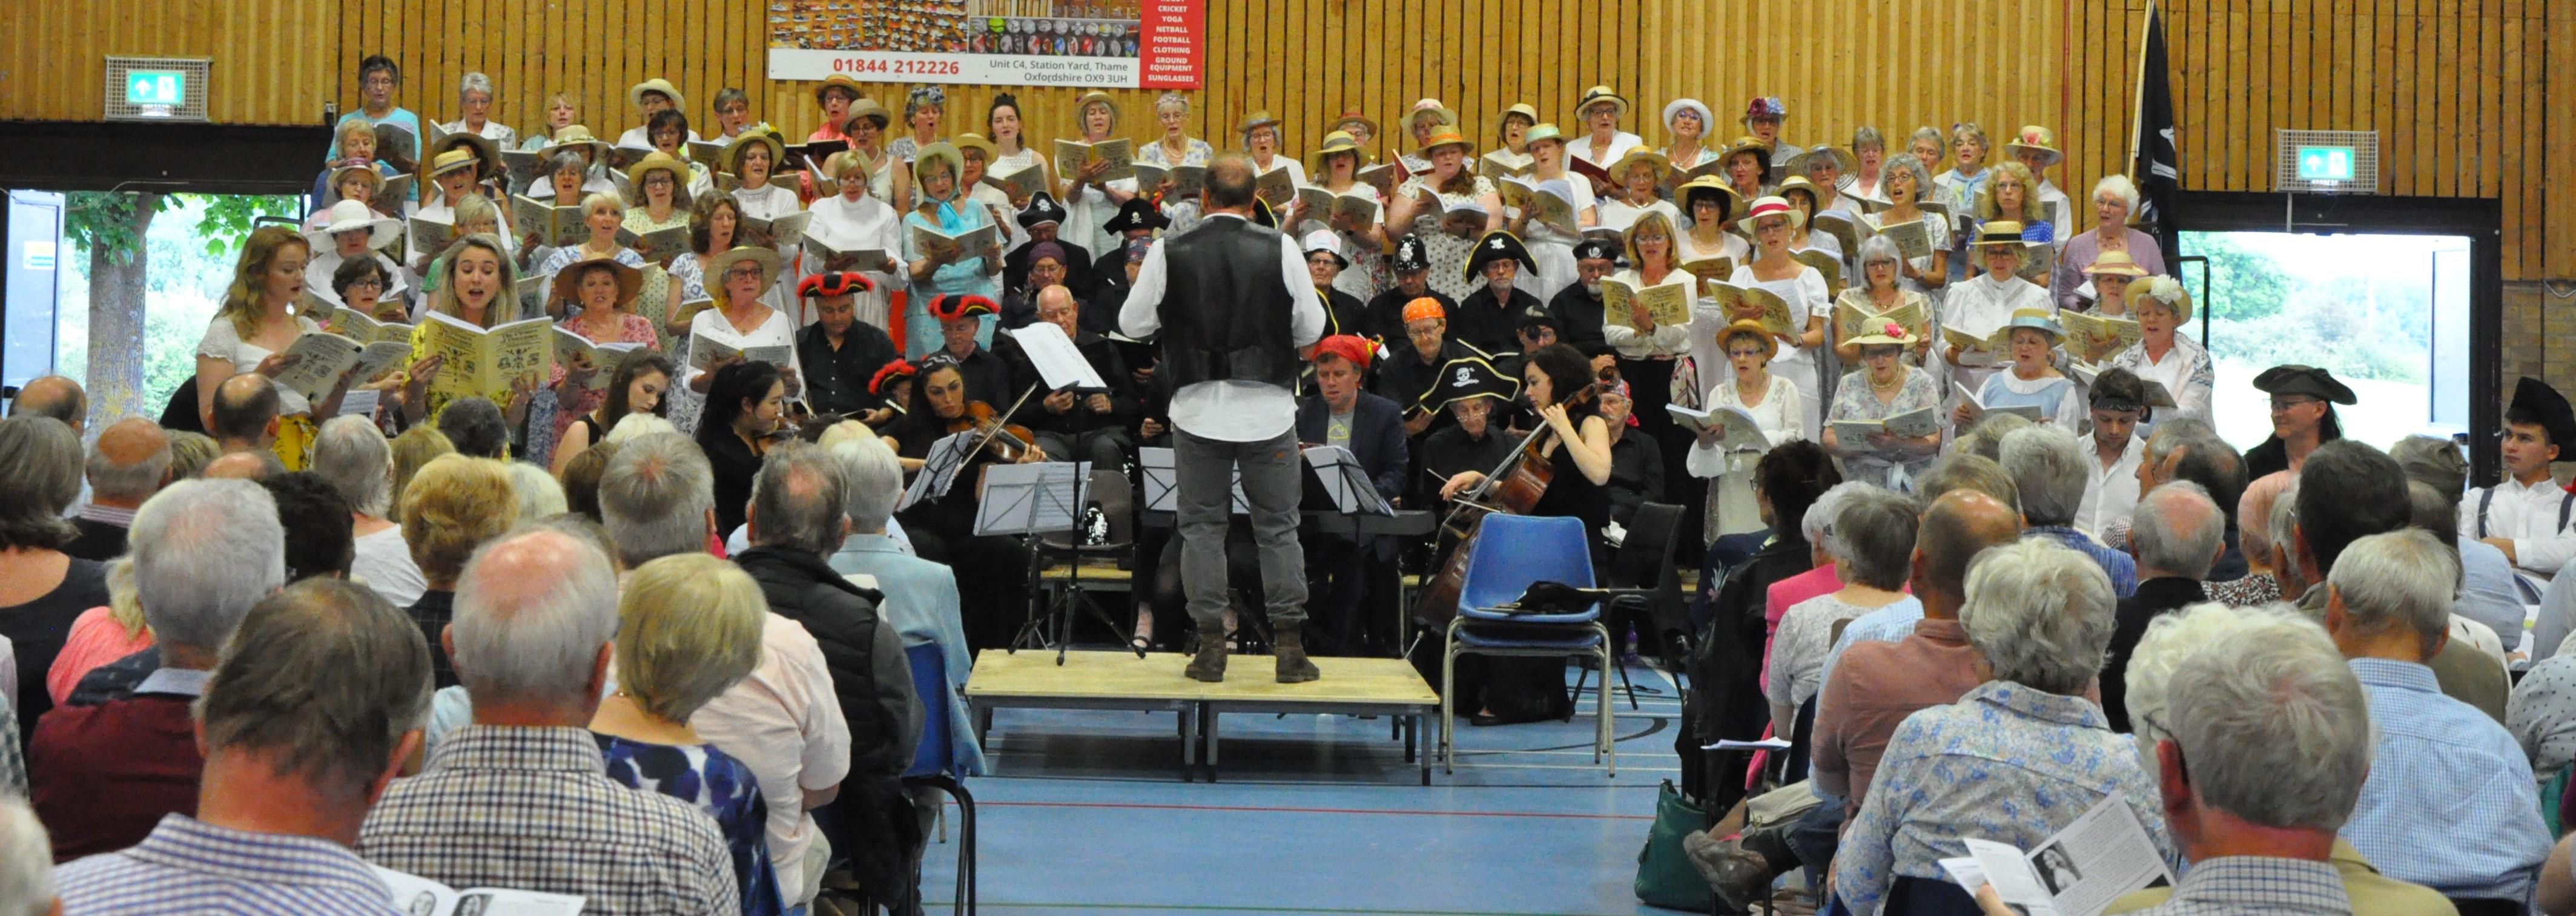 Whole choir 2 (2)